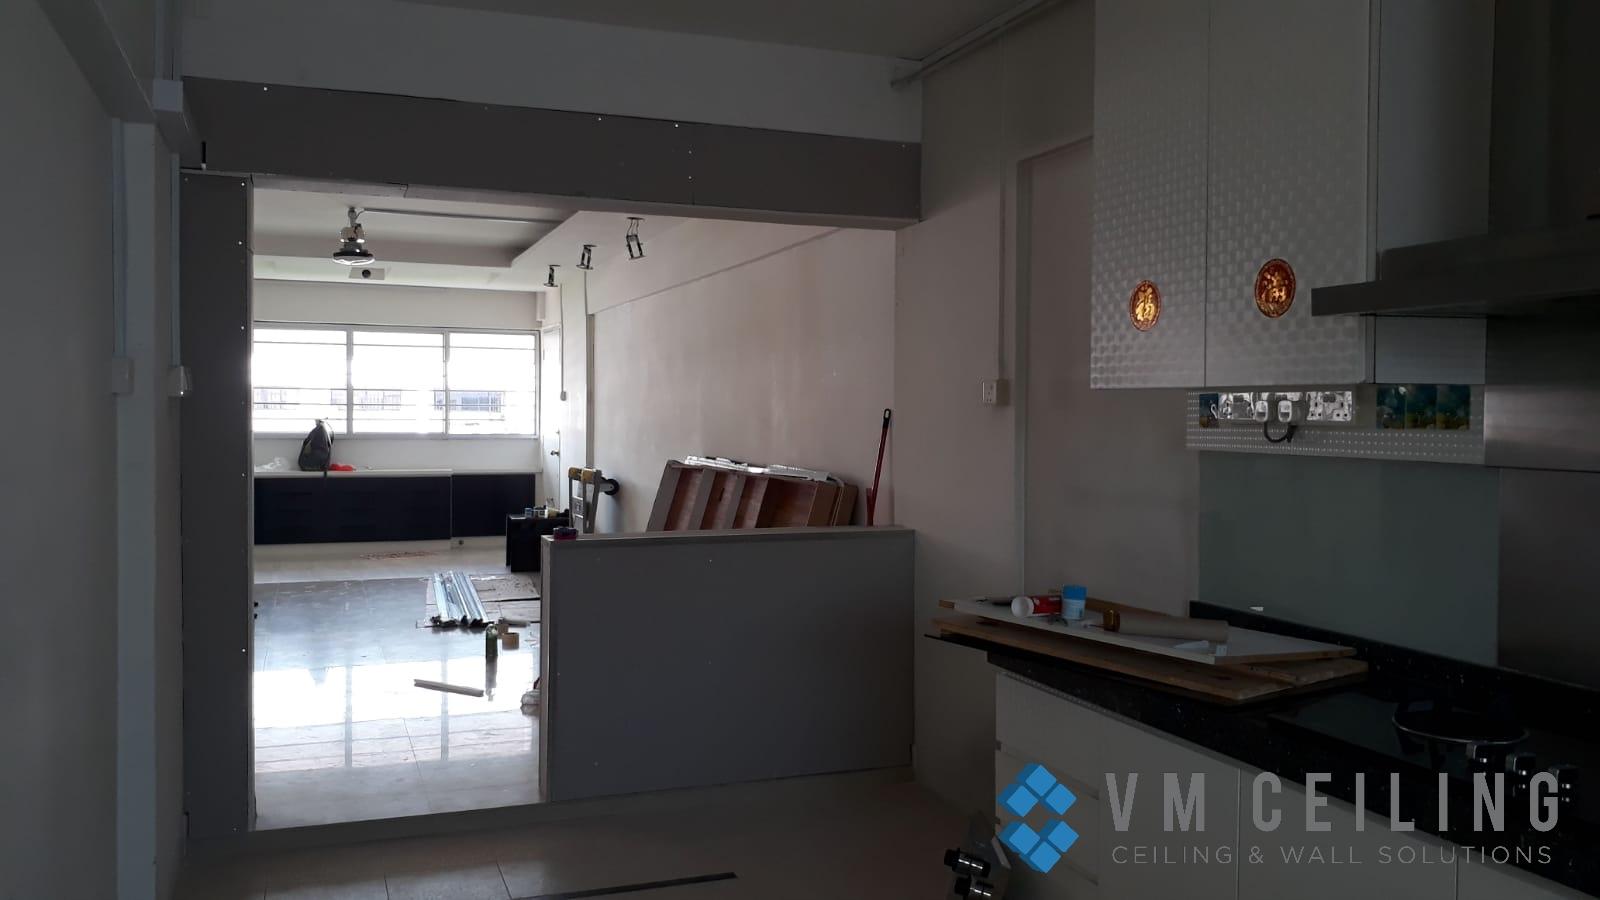 kitchen viewing glass sliding glass door vm ceiling singapore hdb yishun